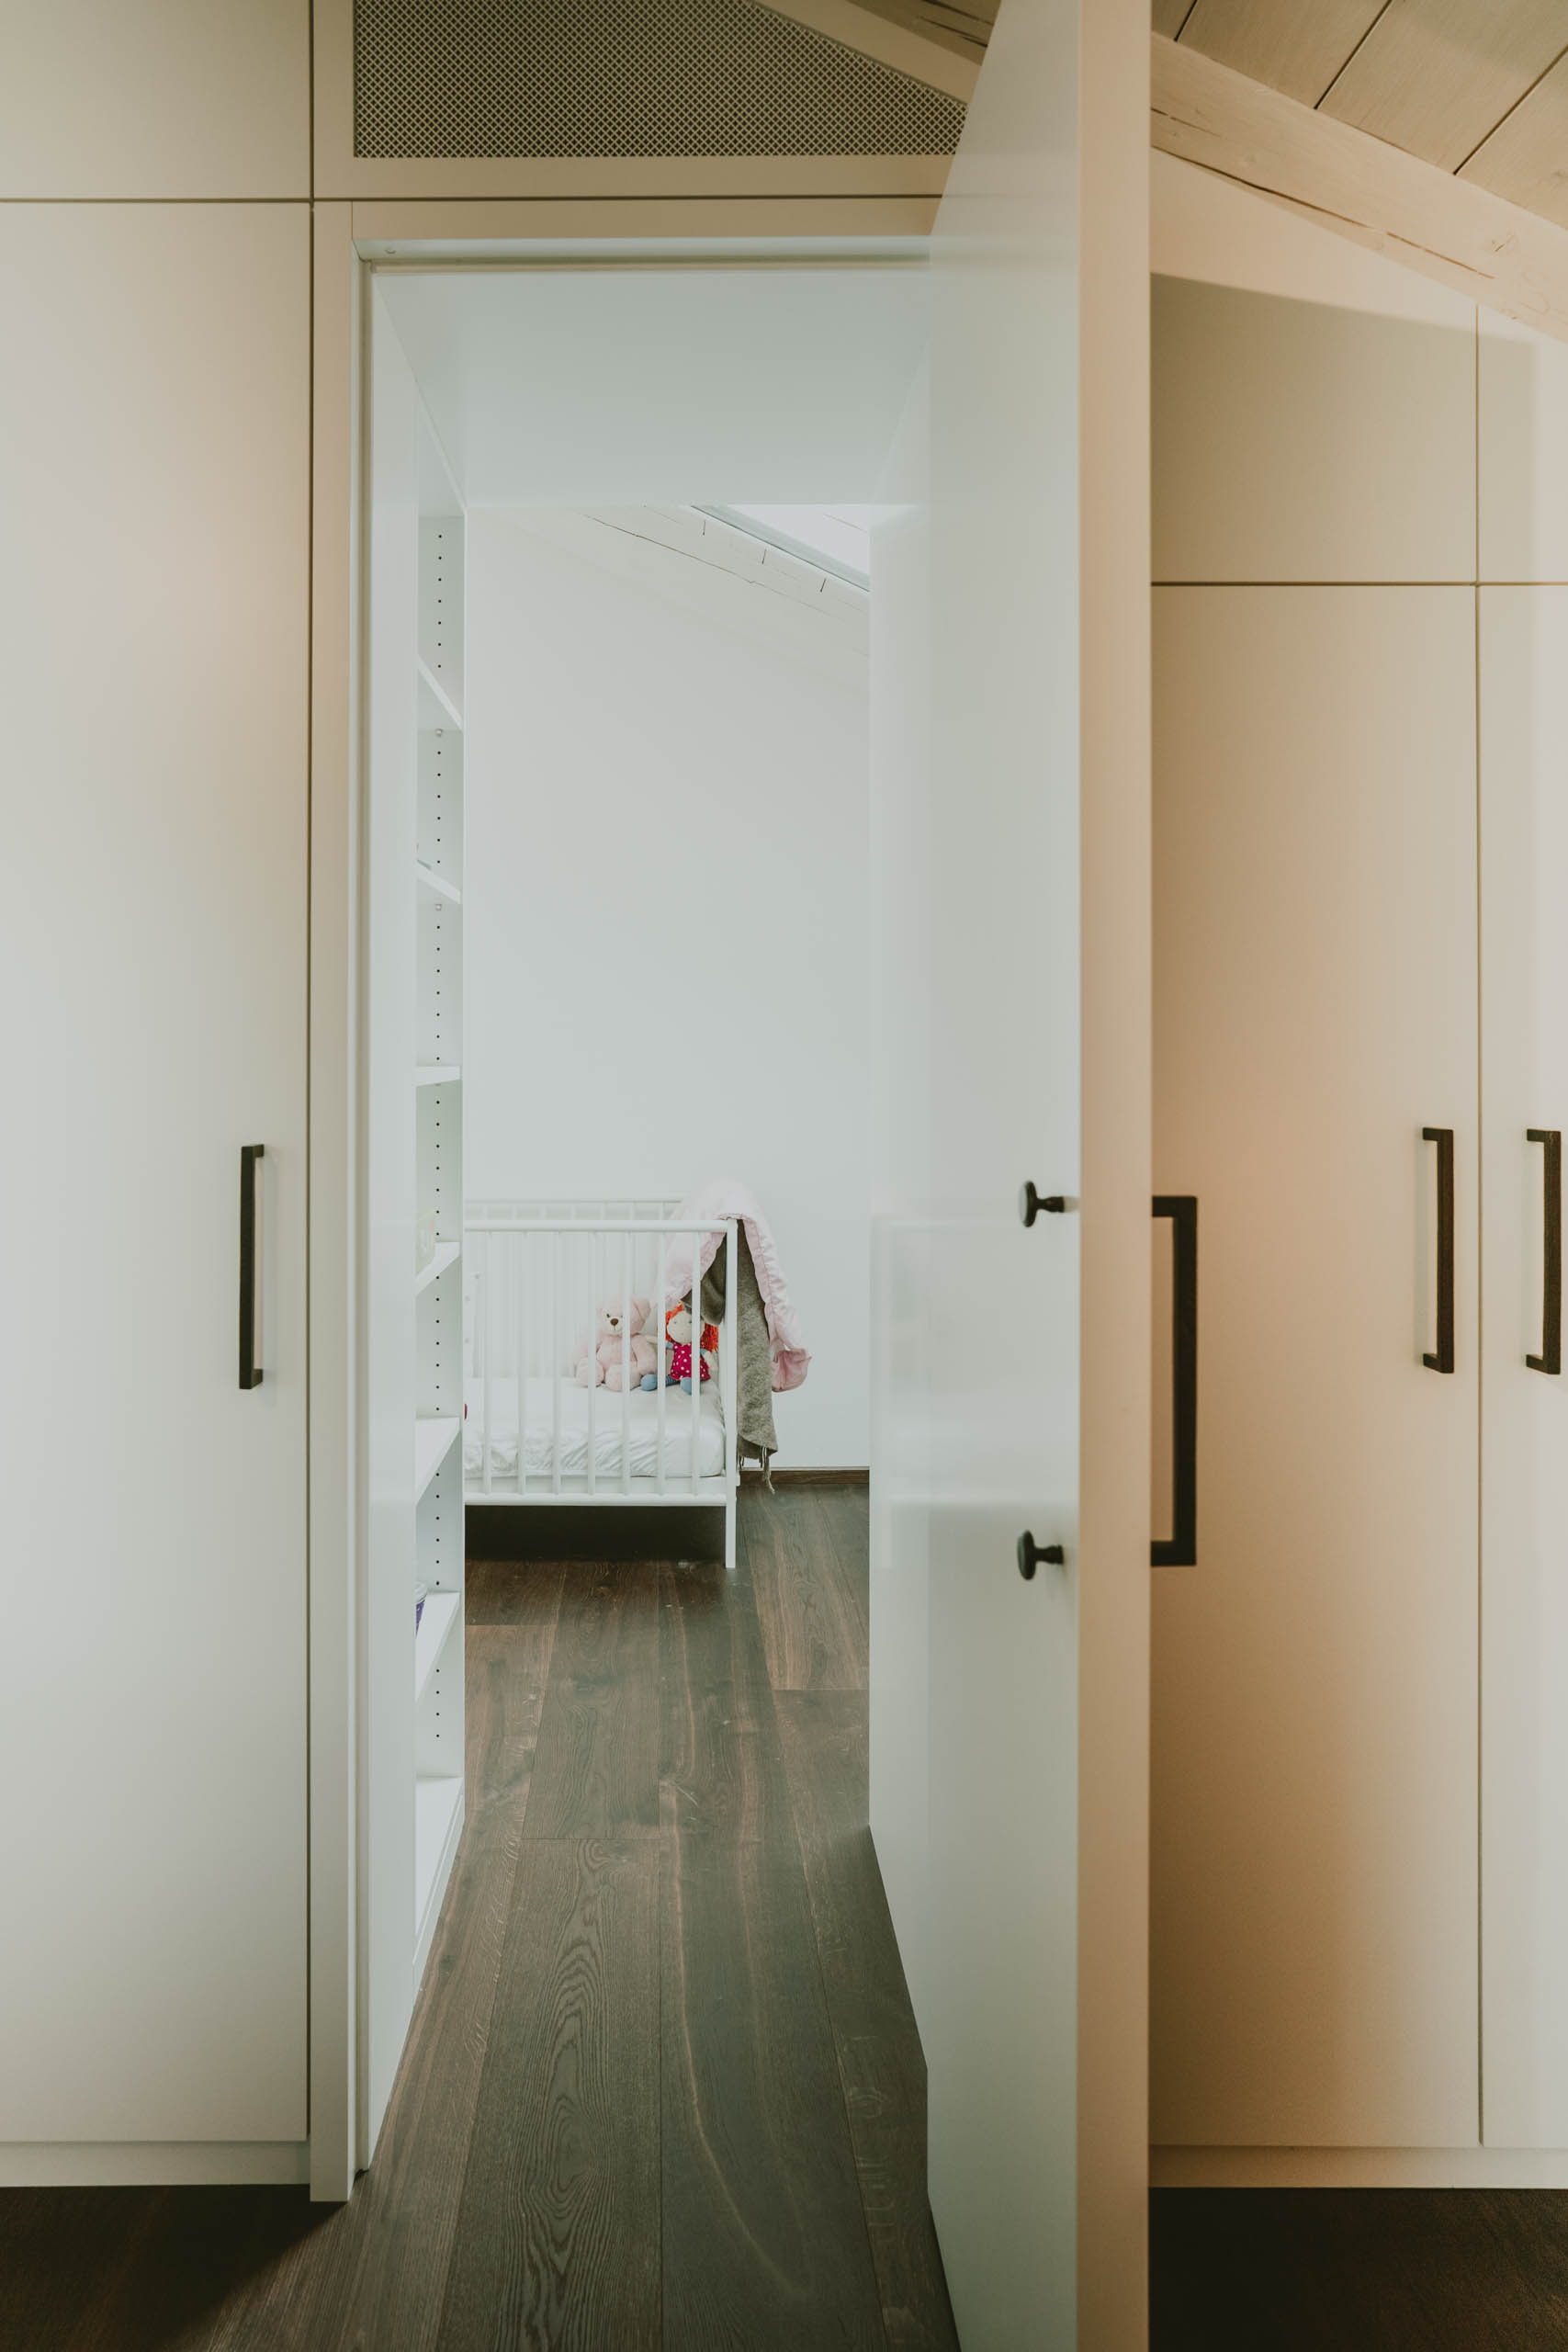 20210521 paula buchner innenarchitektur haus im chiemgau by andreamittermeier 9AM06455